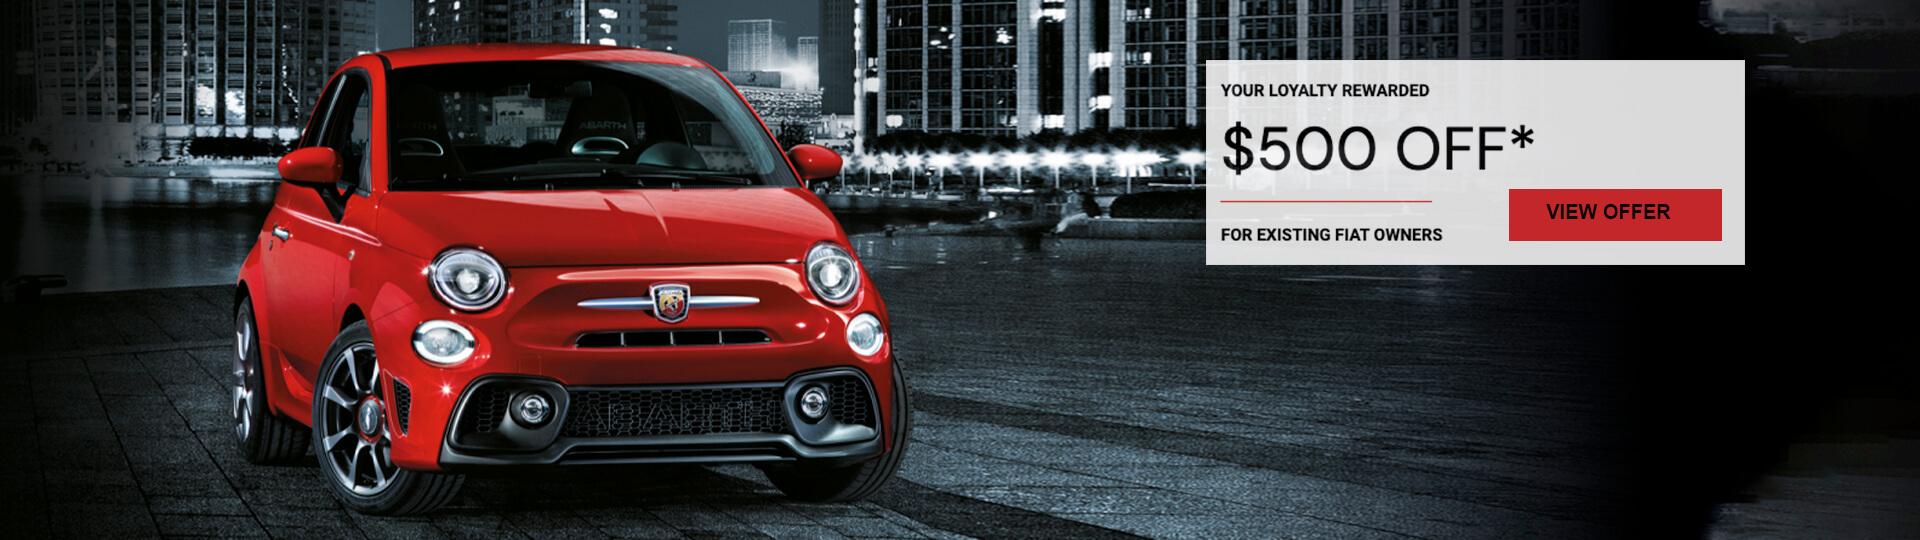 Cricks Auto Fiat December Offers